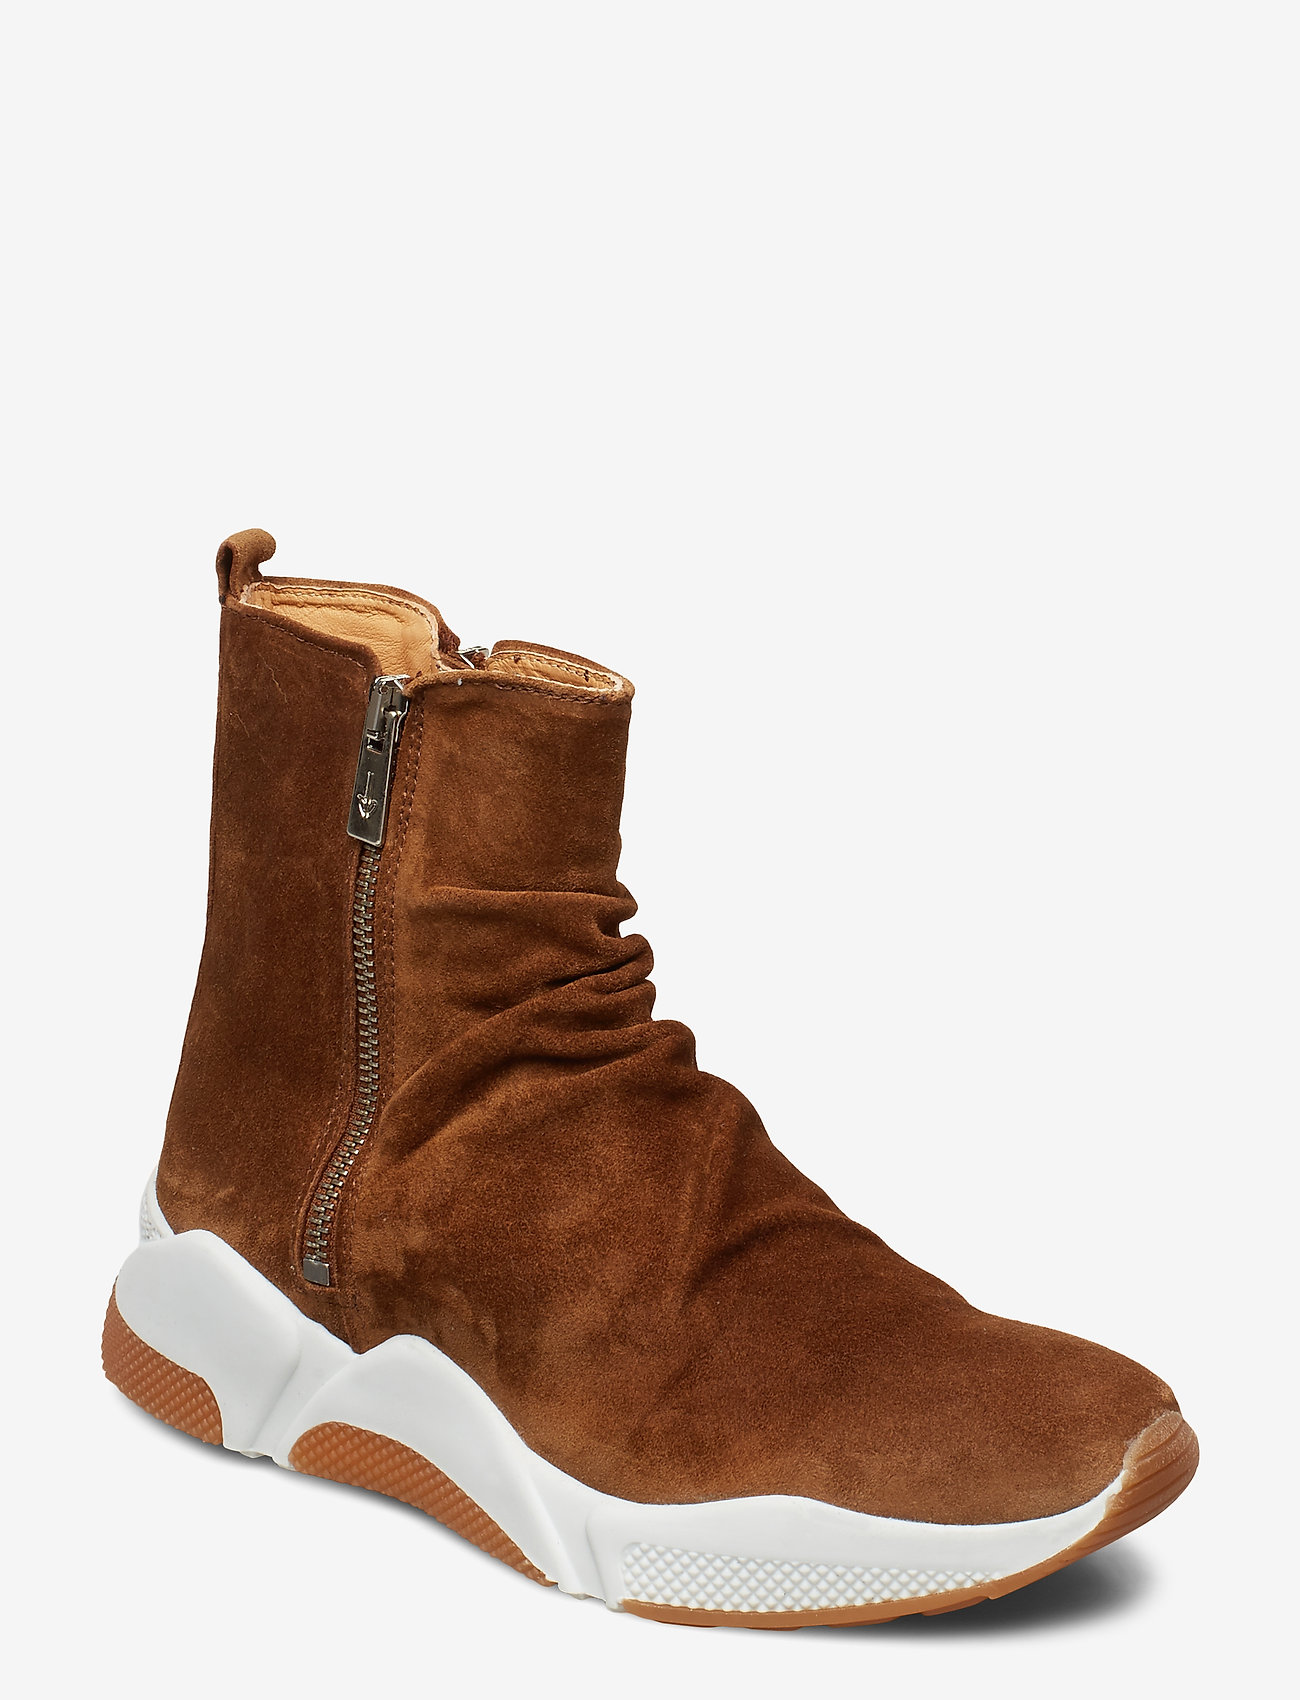 Billi Bi - Sport 4865 - sneakers med høy ankel - tabac babysilk suede 555 - 0